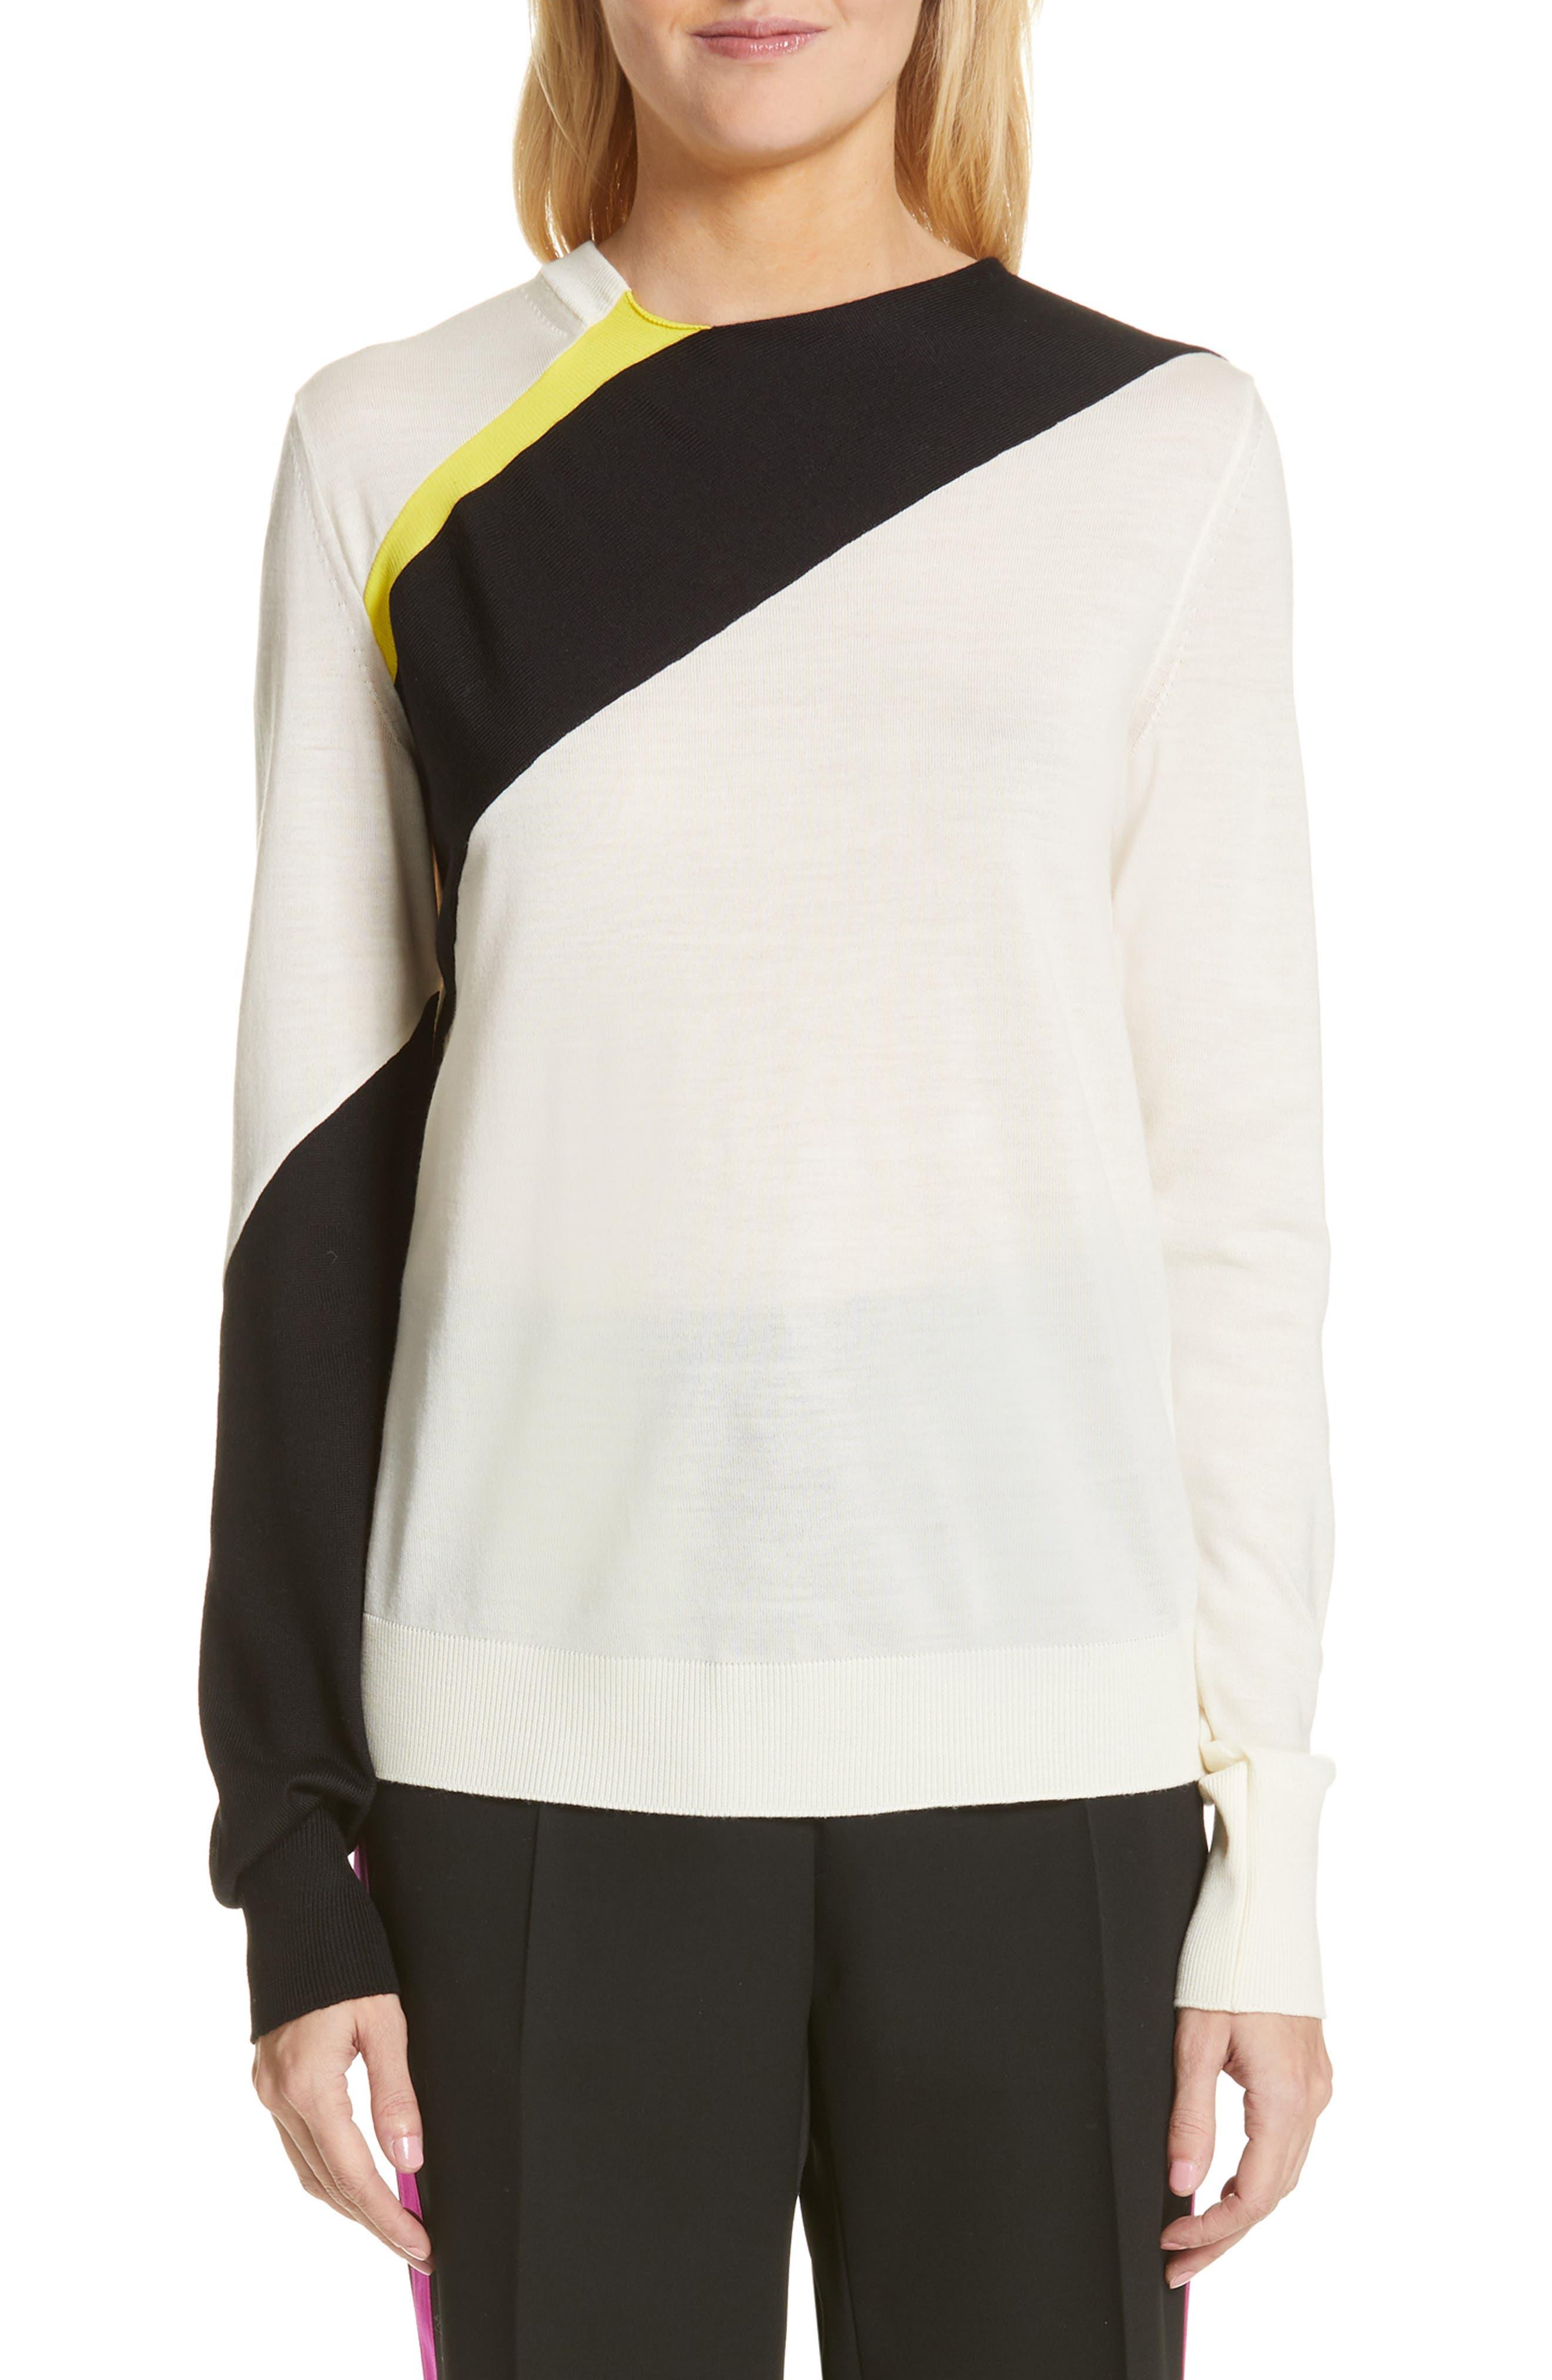 CALVIN KLEIN 205W39NYC, Contrast Stripe Wool Blend Sweater, Main thumbnail 1, color, WHITE BLACK TOURNESOL